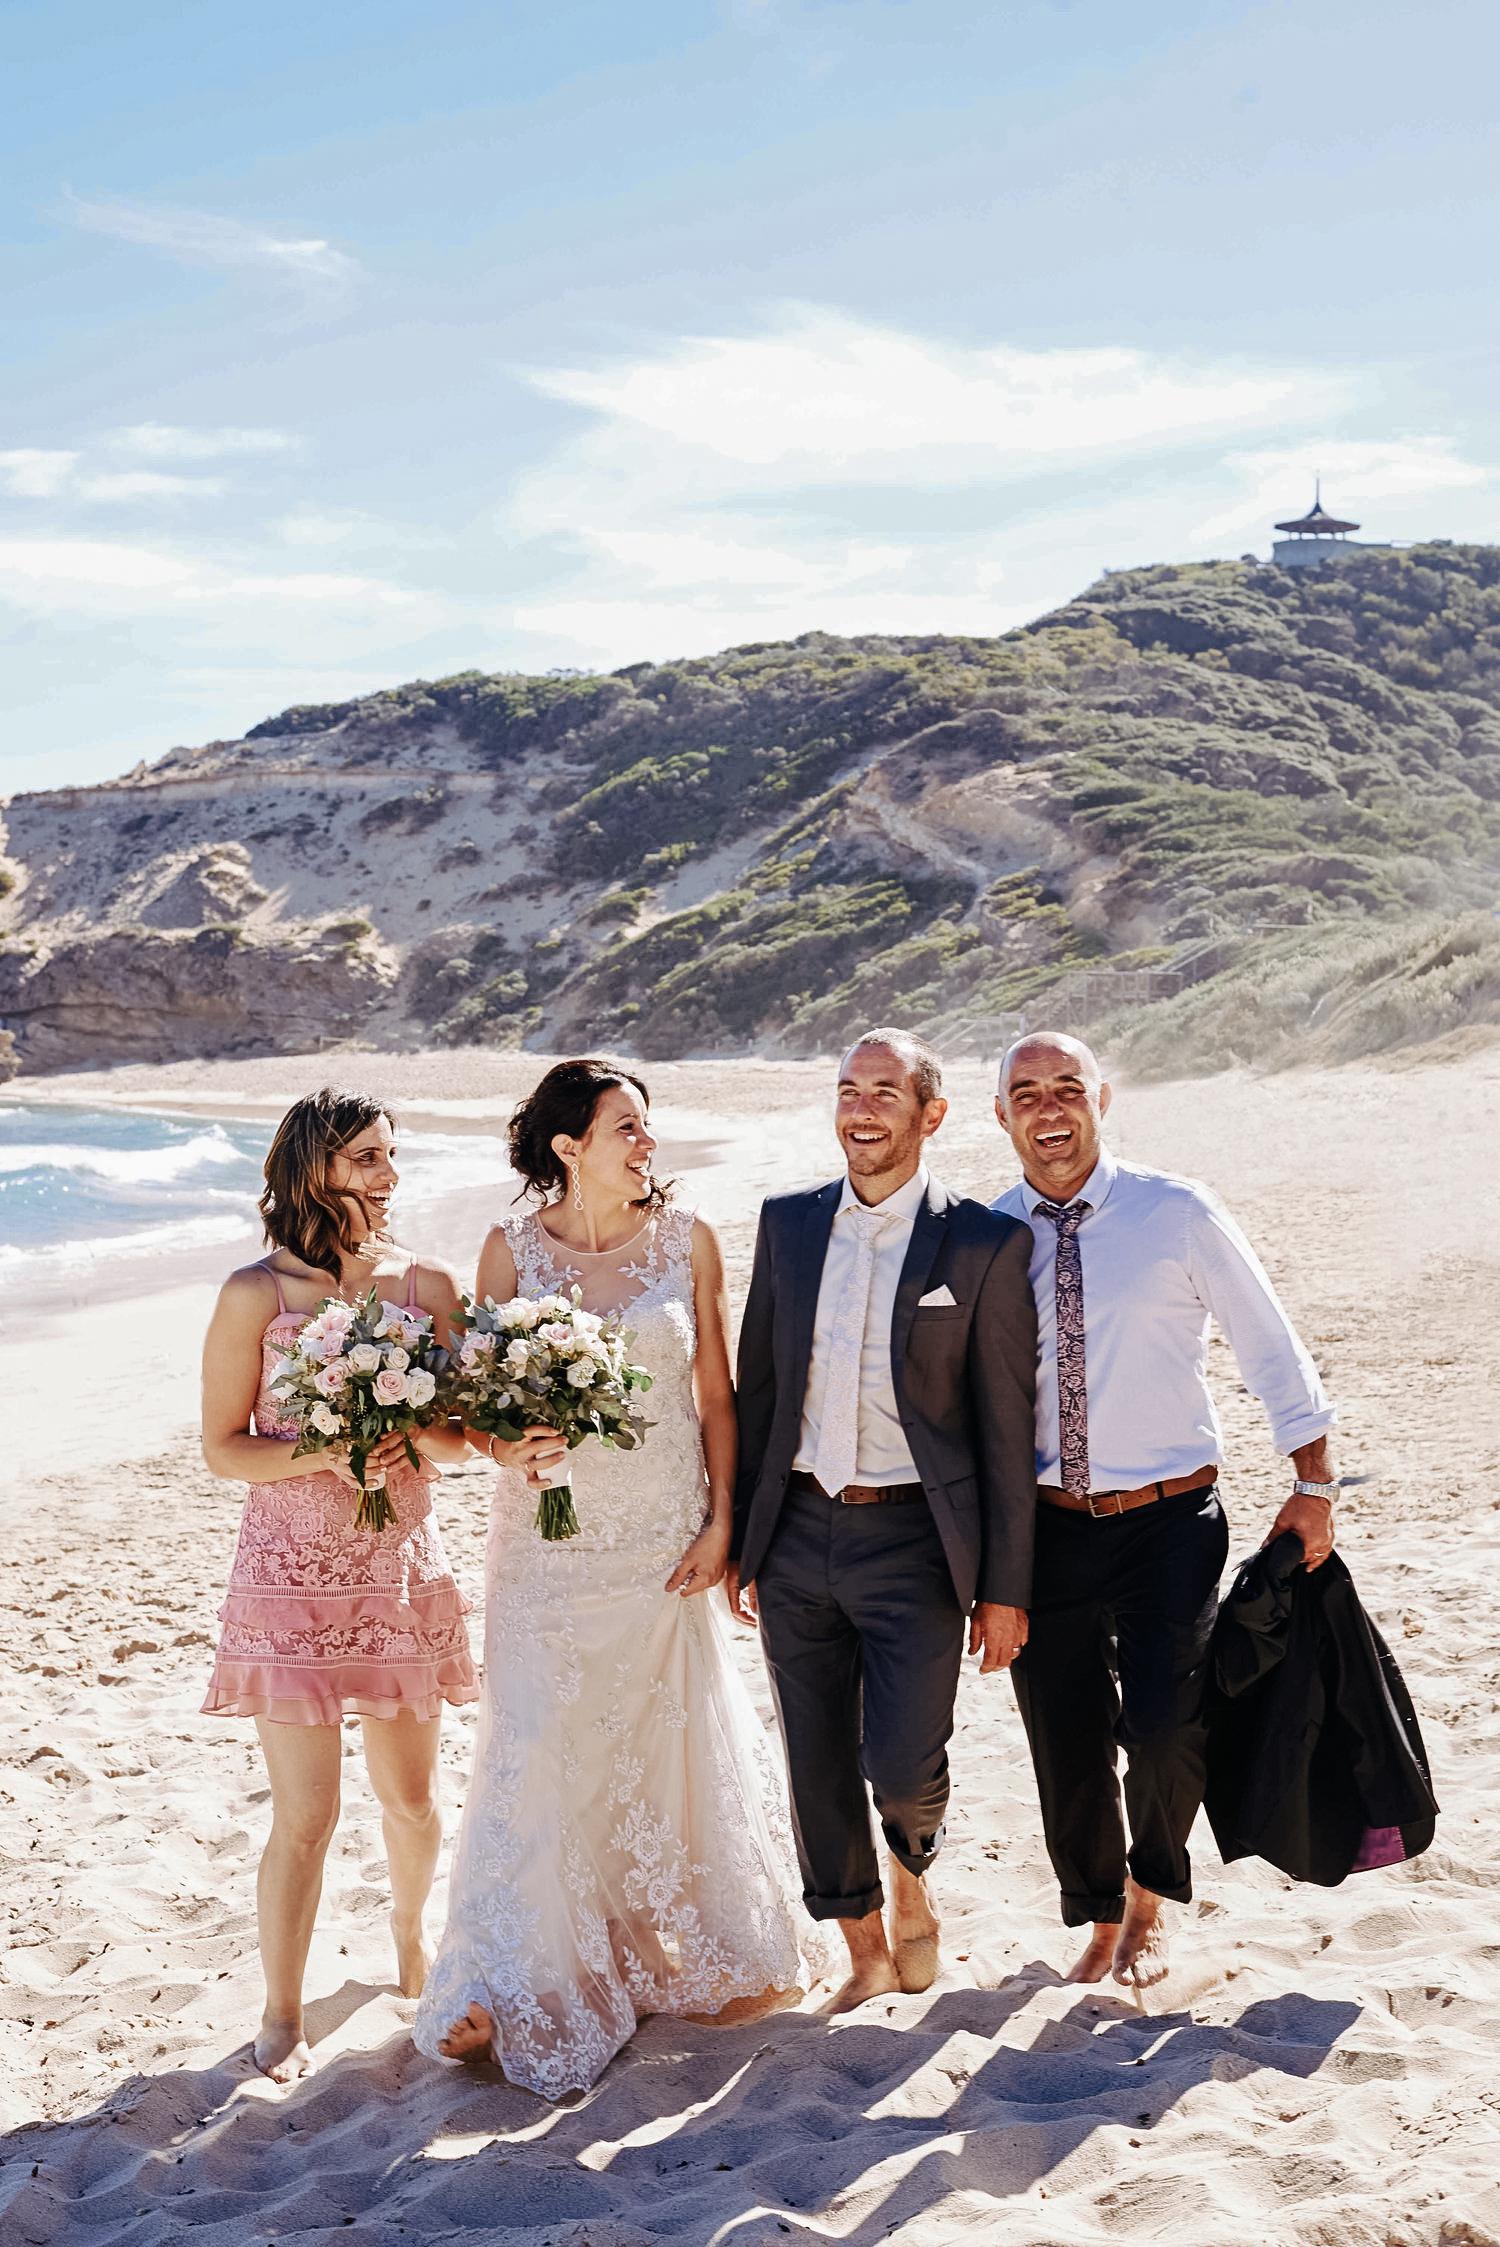 NissandCam-marissa-jade-mornington-peninsula-wedding-photographer-natural-136-2.jpg